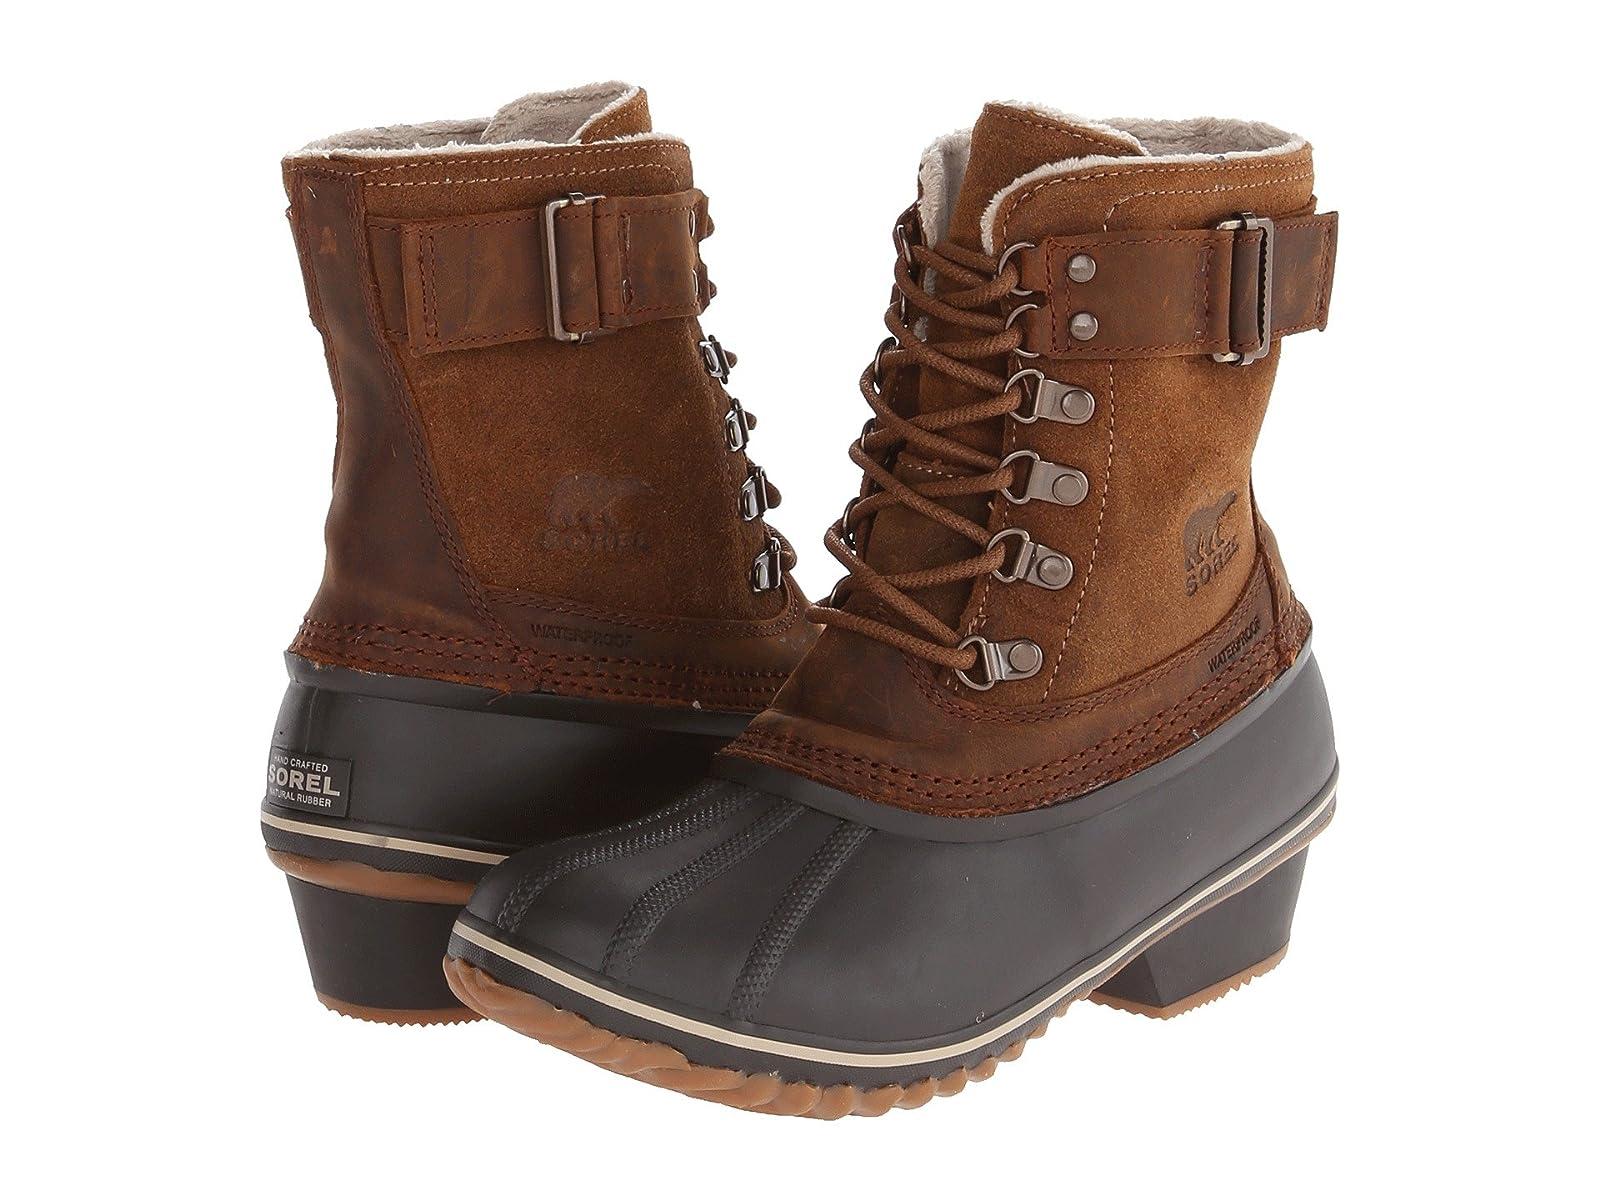 SOREL Winter Fancy™ Lace IICheap and distinctive eye-catching shoes